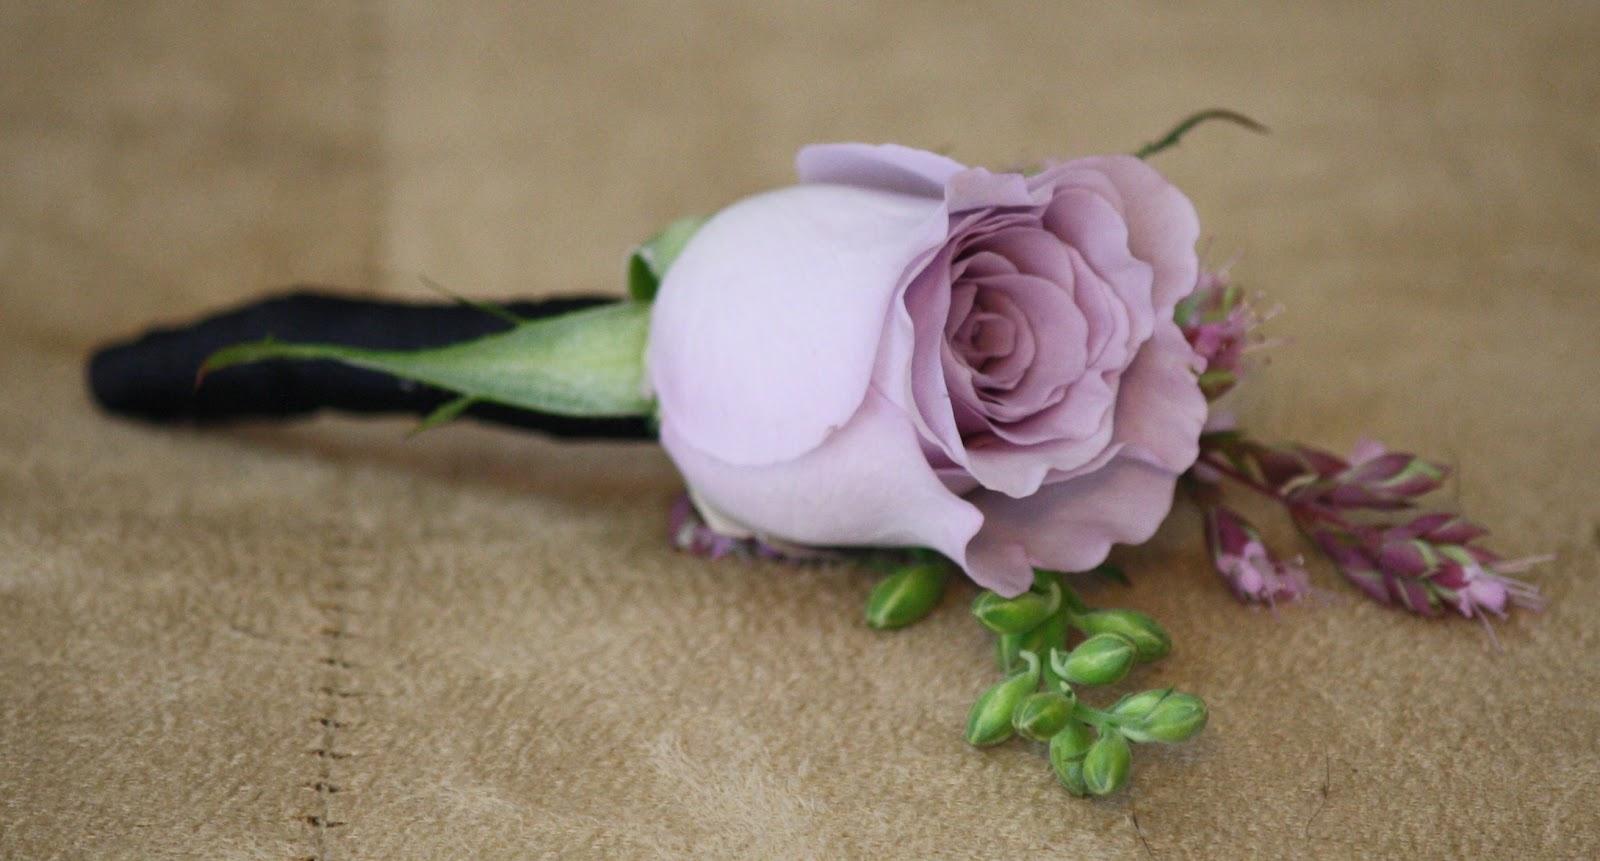 Rose Boutonniere - Boutonnieres - Wedding Flowers - Groom - Usher - Best Man - Groomsmen - Ushers - Groom's Boutonniere